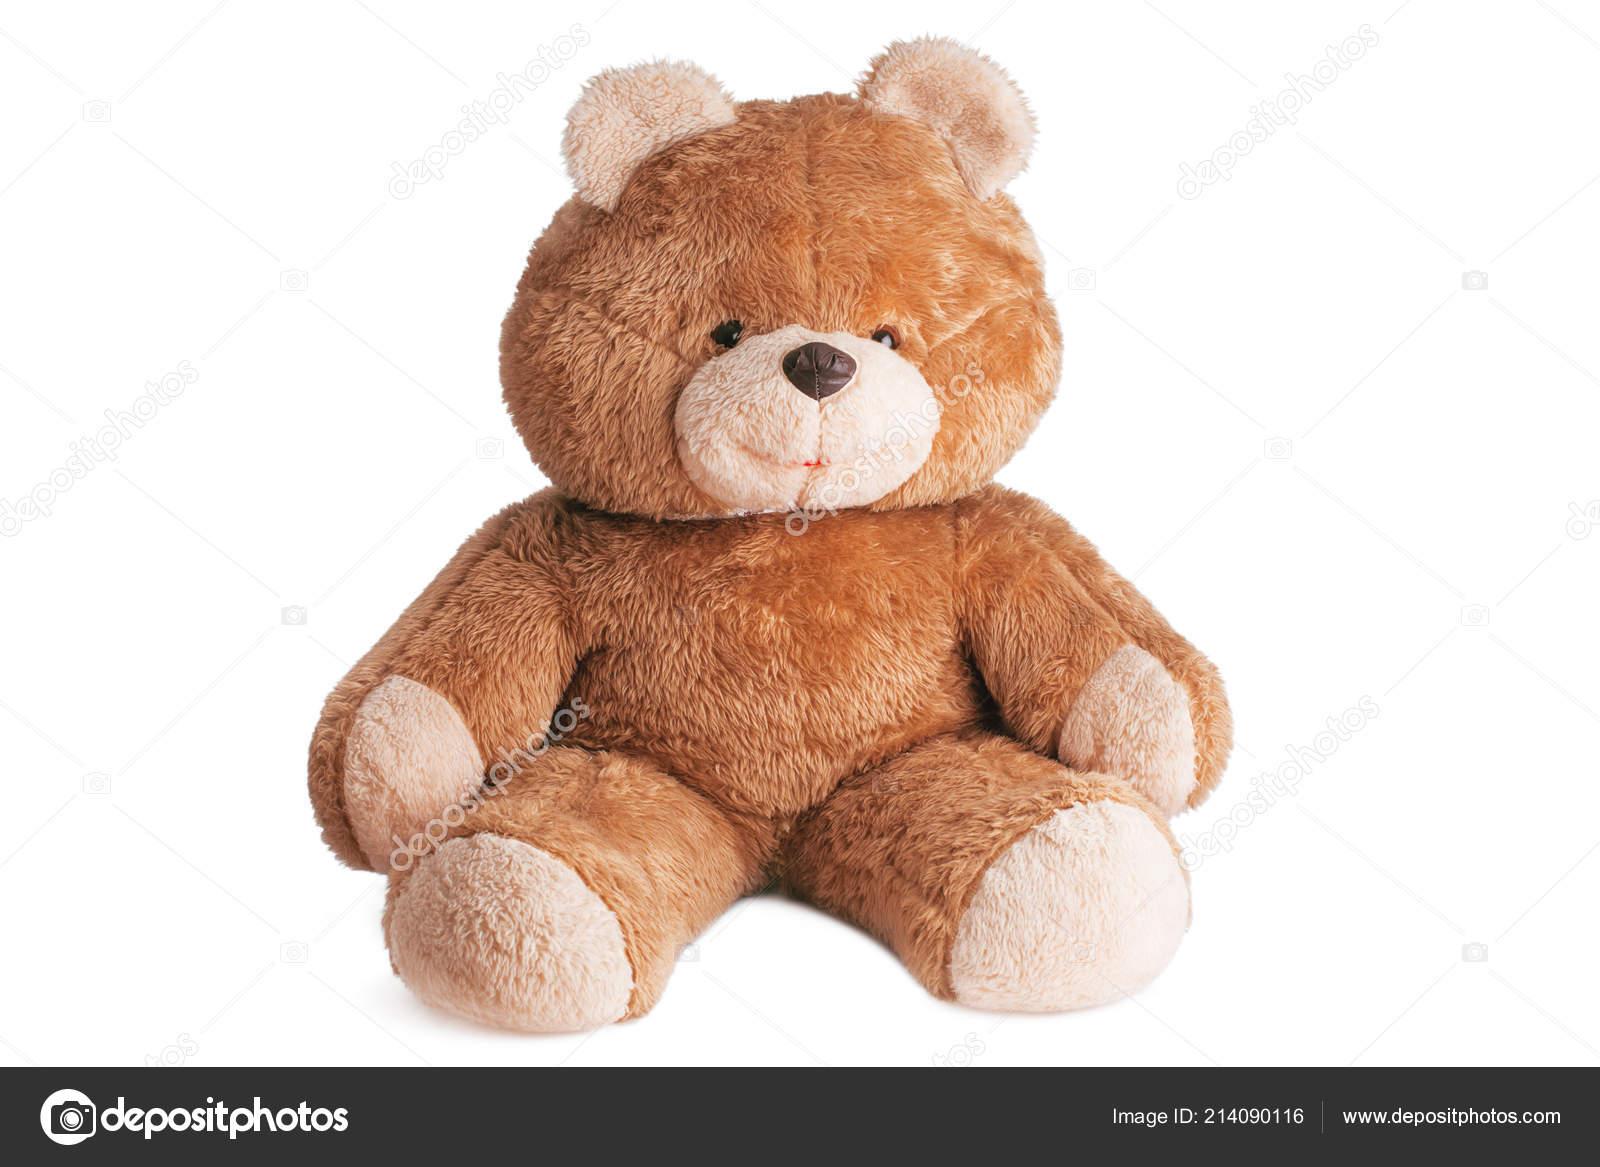 Hay Hay Chicken Stuffed Animal, Big Fluffy Teddy Bear Toy Isolated White Background Stock Photo C Valio84sl 214090116